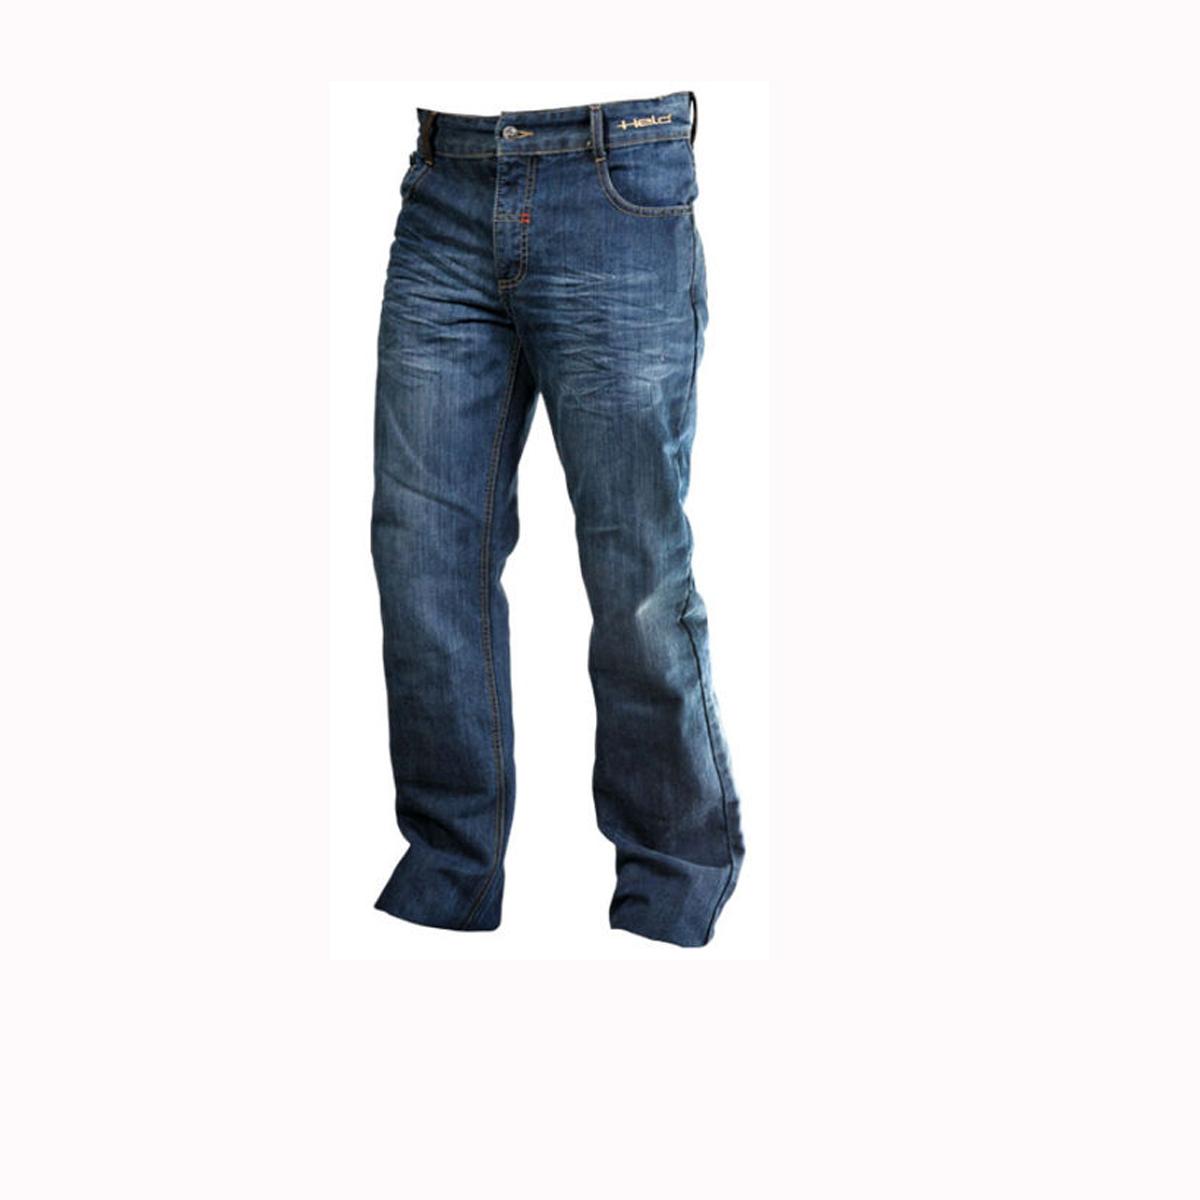 Held Cracker Jeans